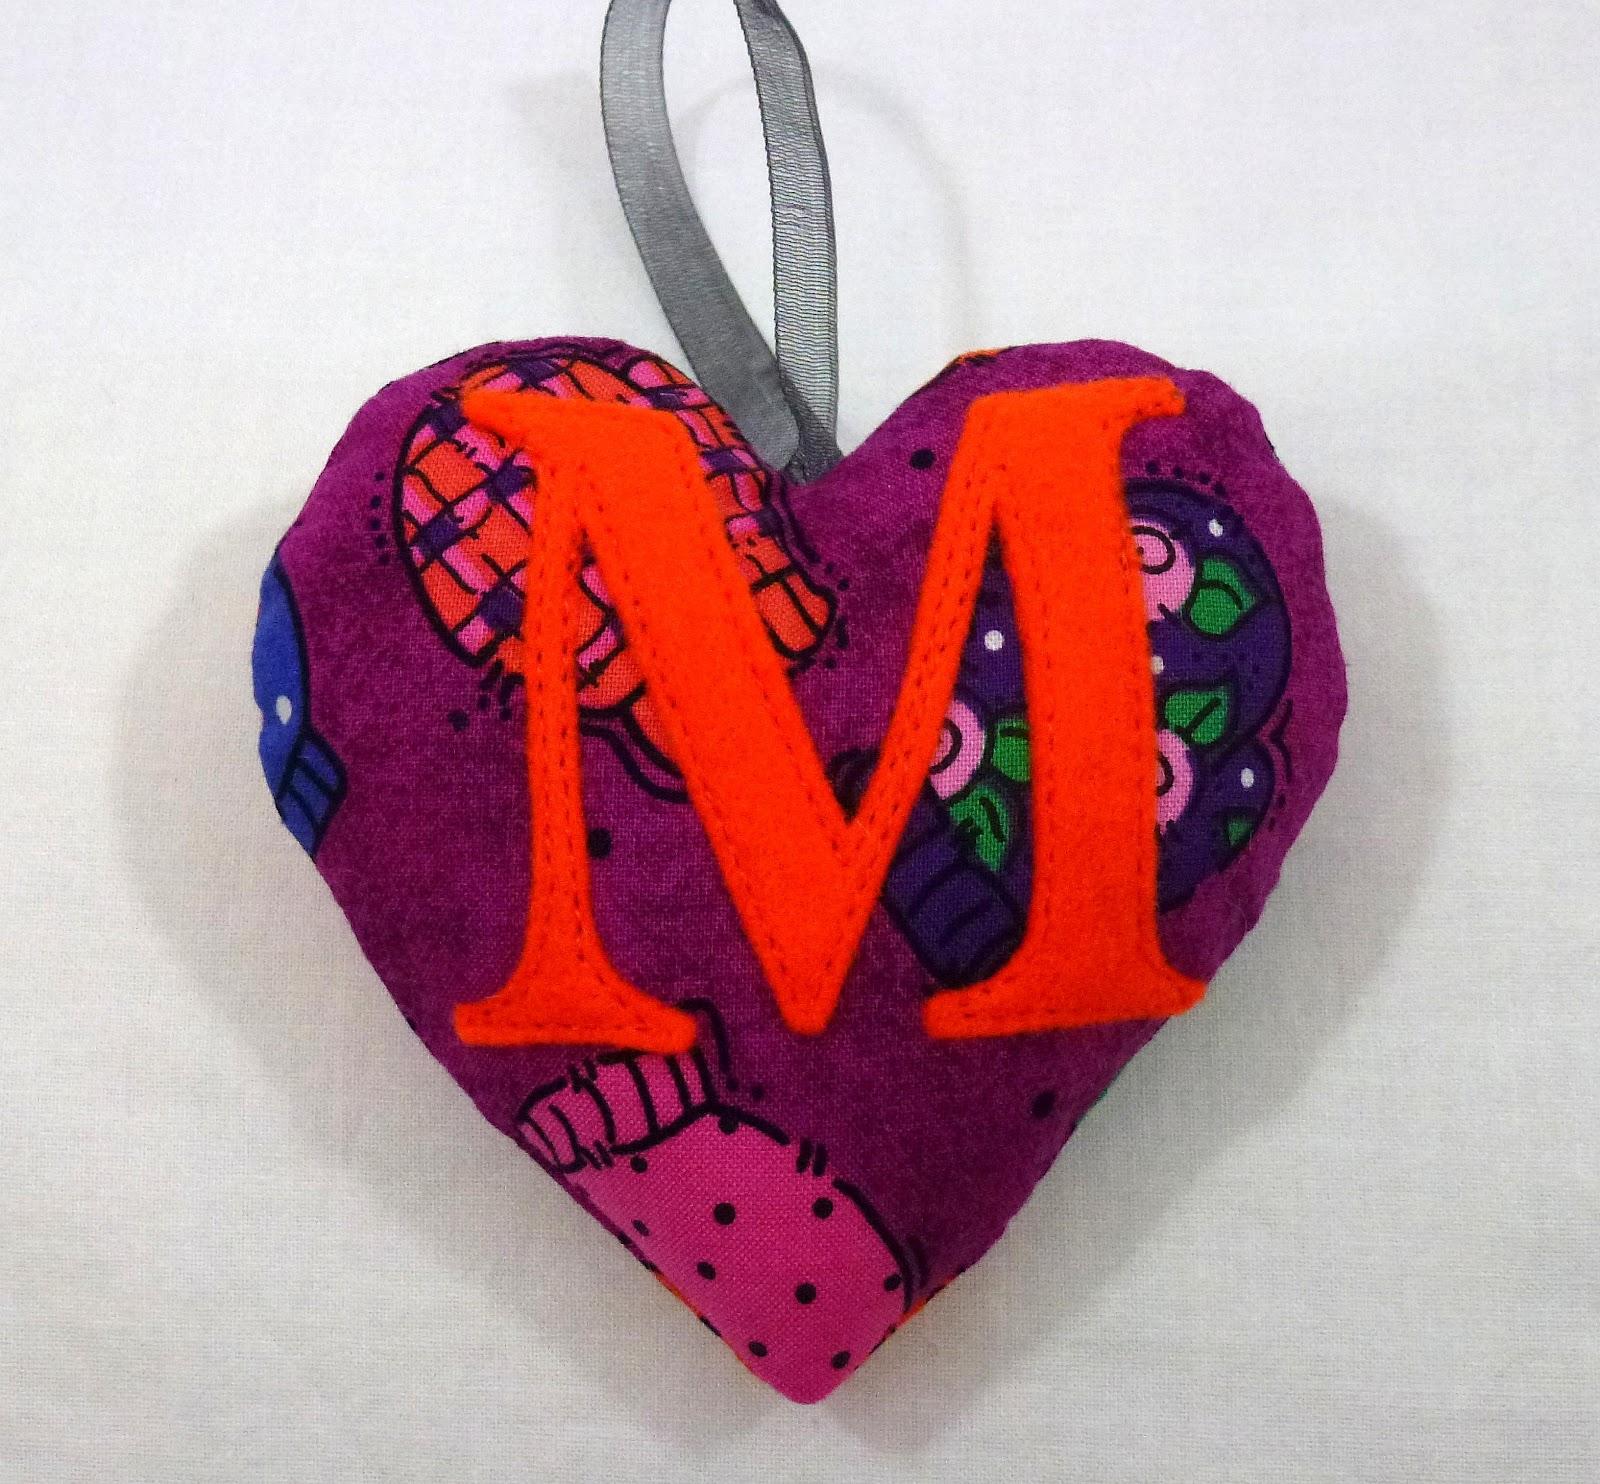 365 Sewn Hearts April 2012